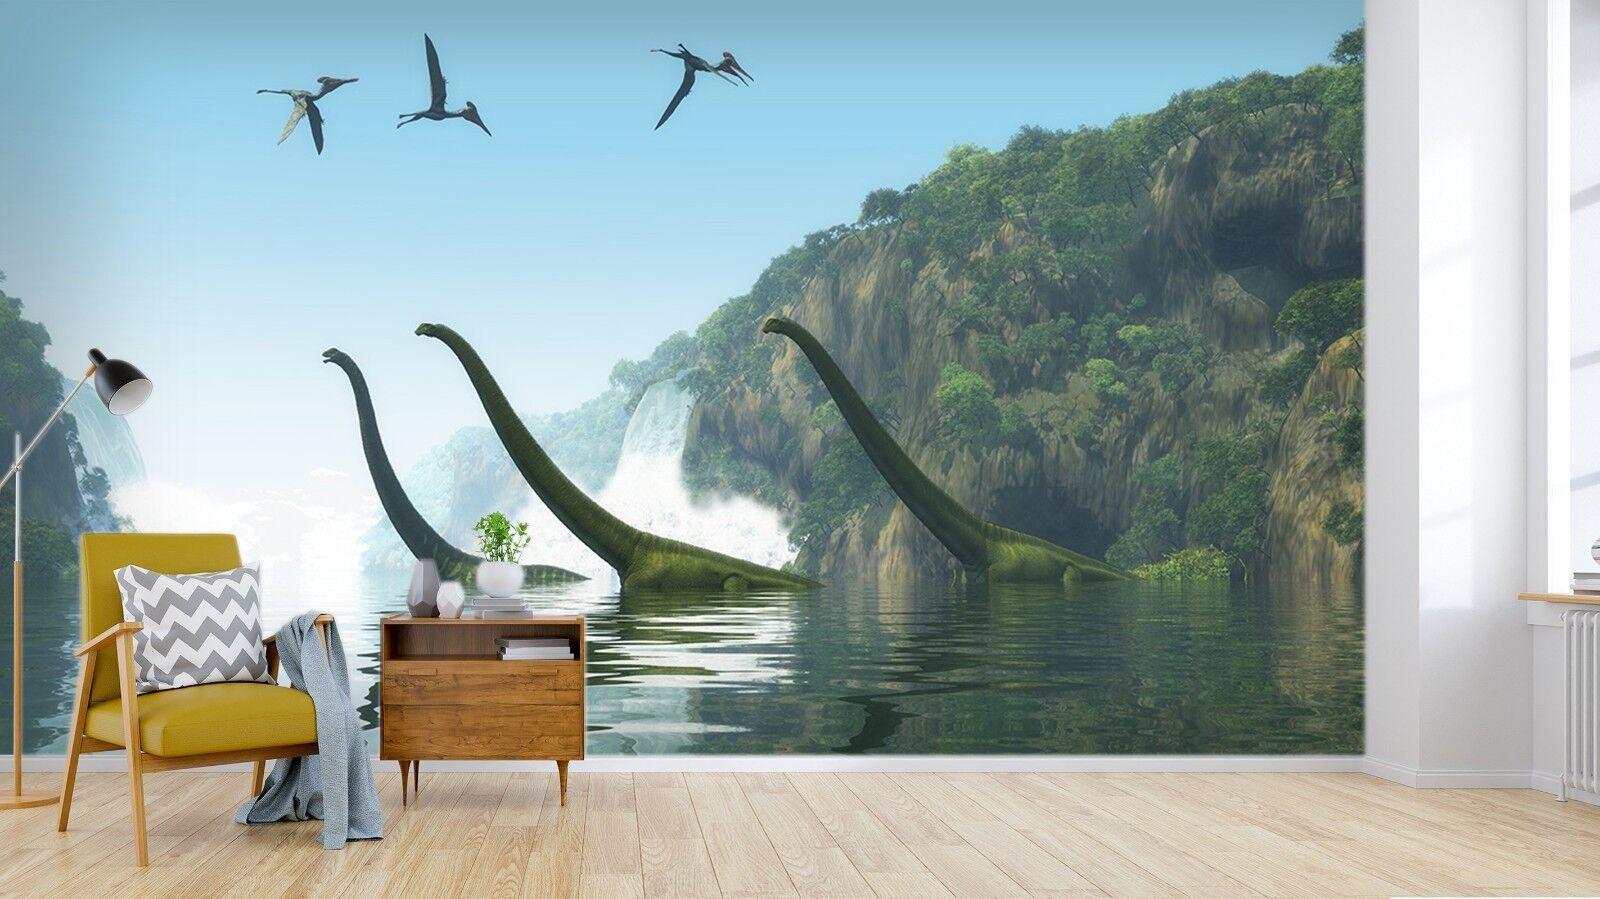 3D Dinosaur River Forest 3 Wallpaper Mural Print Wall Indoor Wallpaper Murals UK